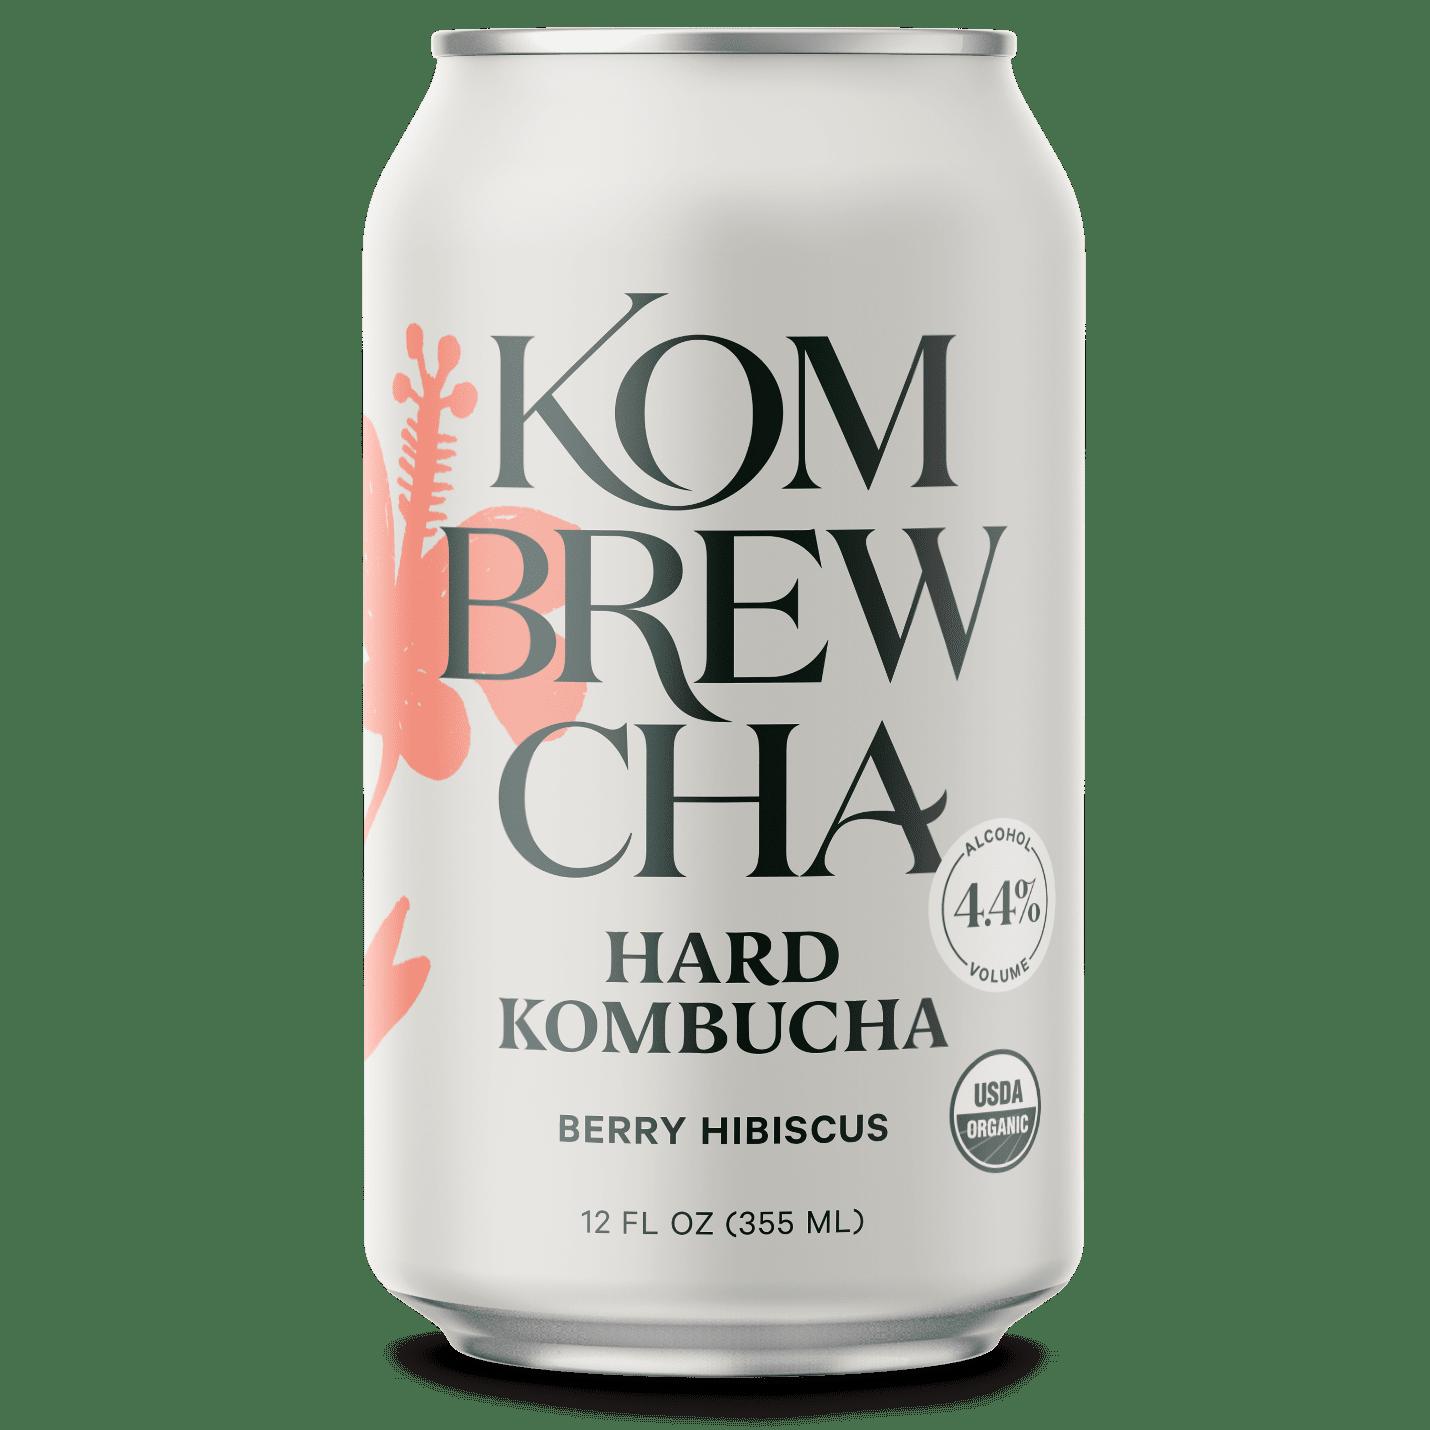 Kombrewcha Berry Hibiscus (Hard Kombucha)